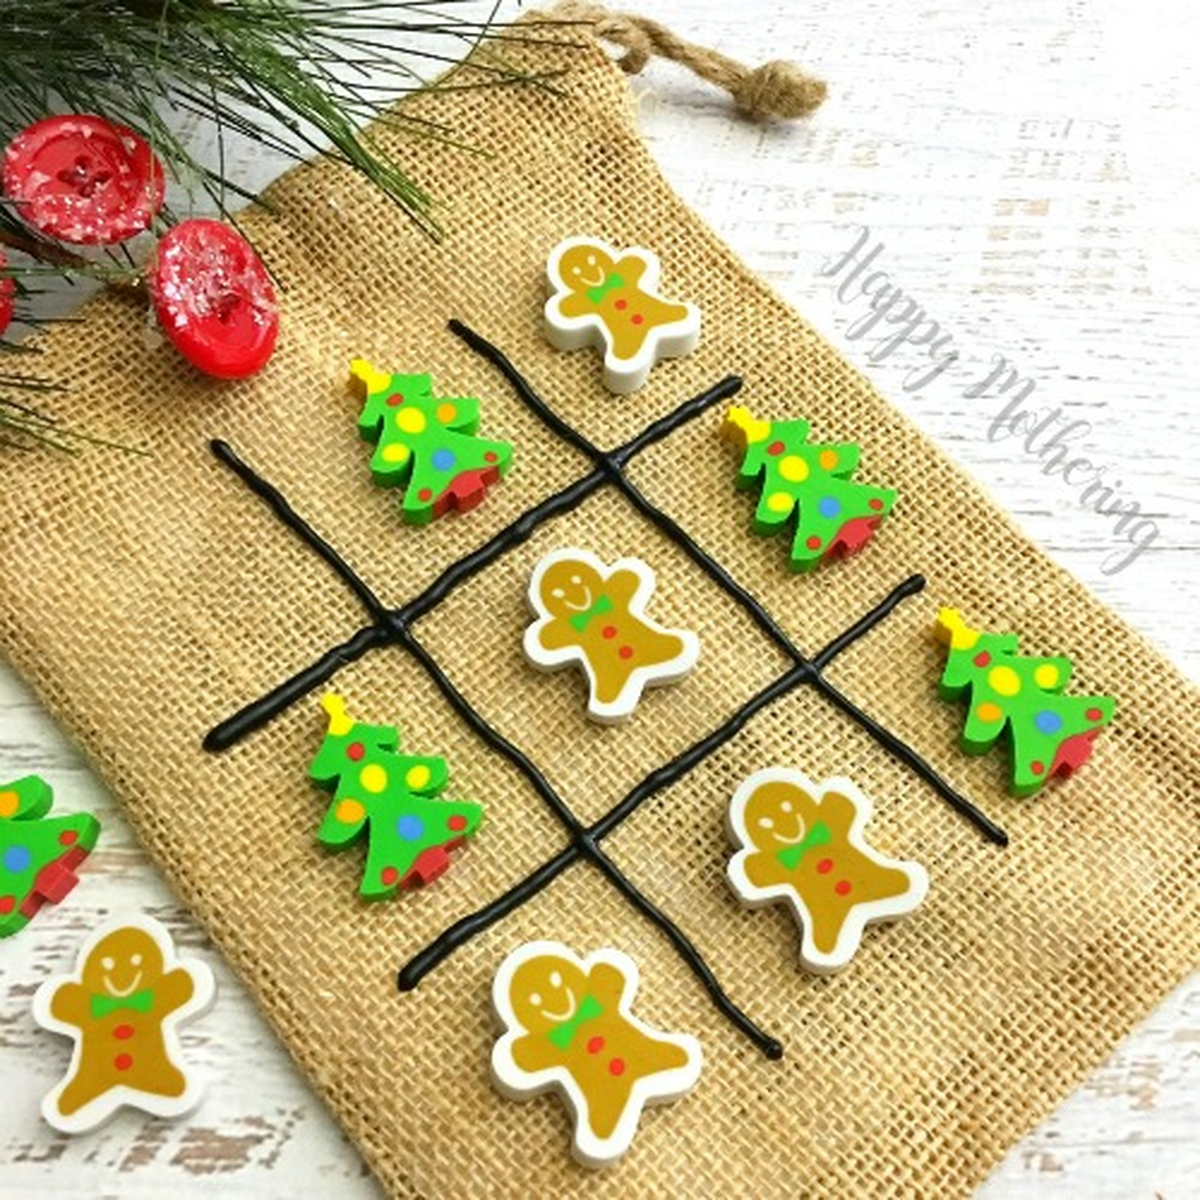 DIY Tic Tac Toe Game Christmas craft for kids